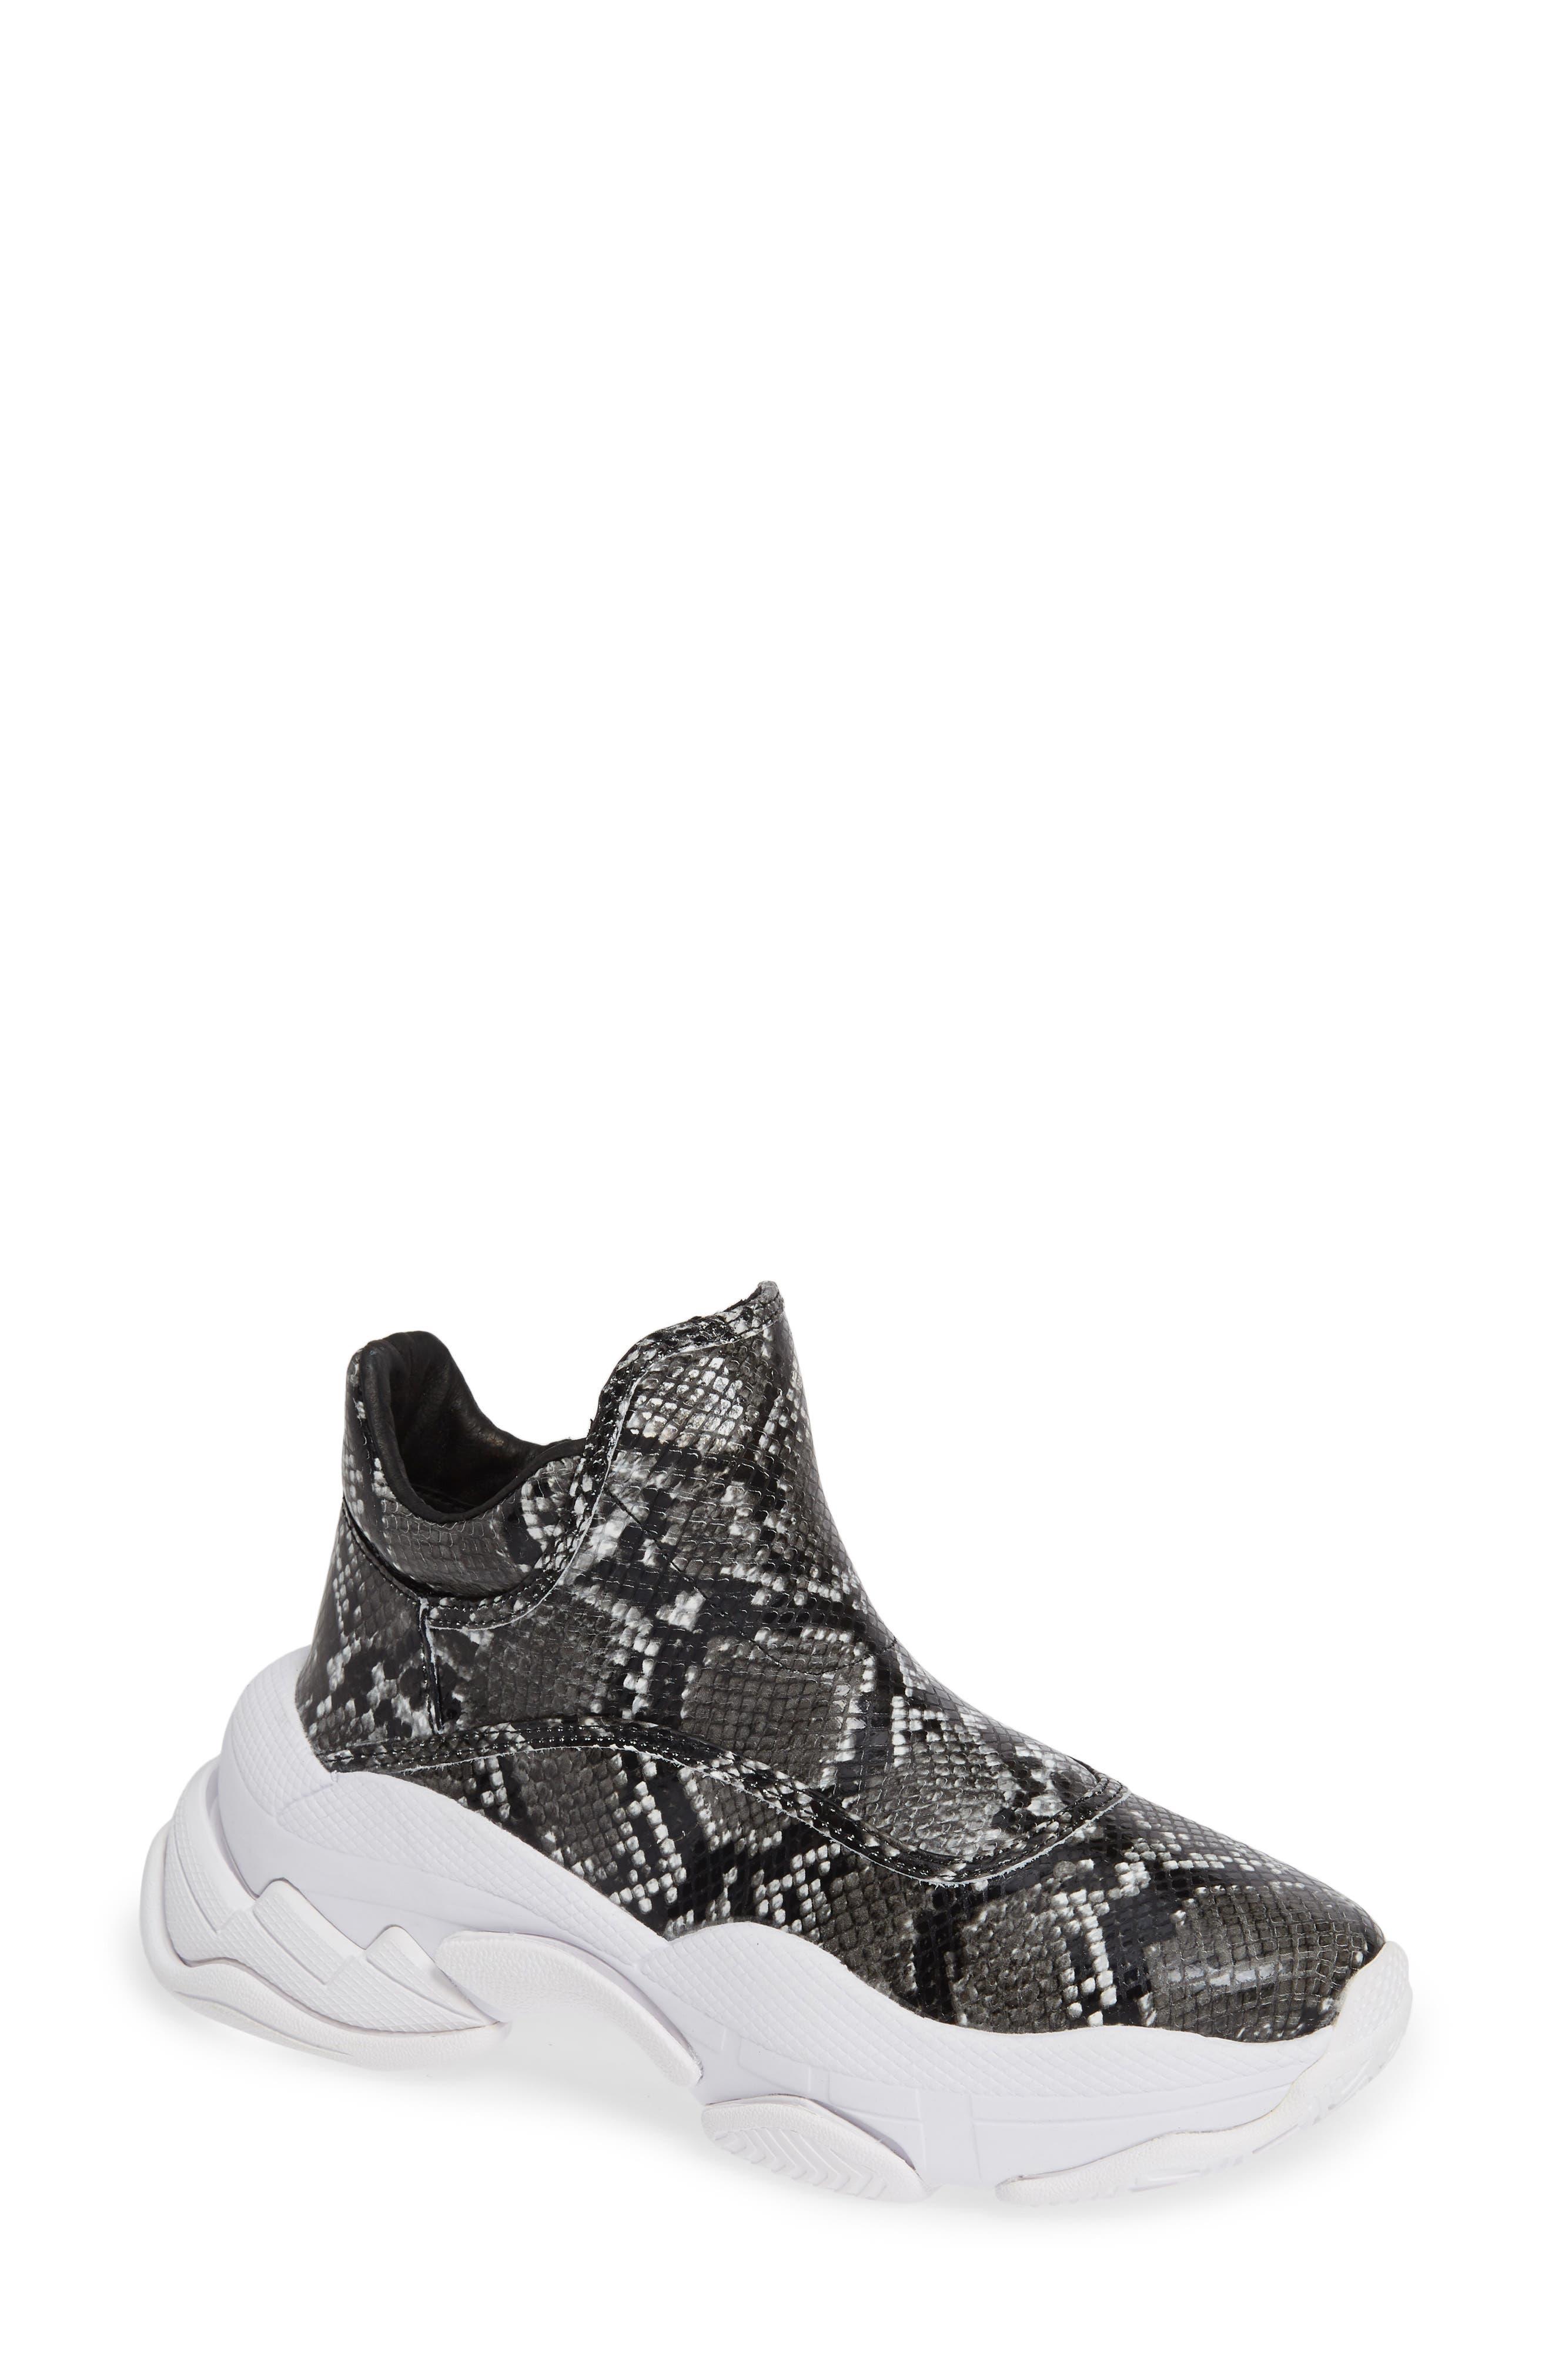 CTRL-DEL Sneaker,                             Main thumbnail 1, color,                             GREY BLACK SNAKE